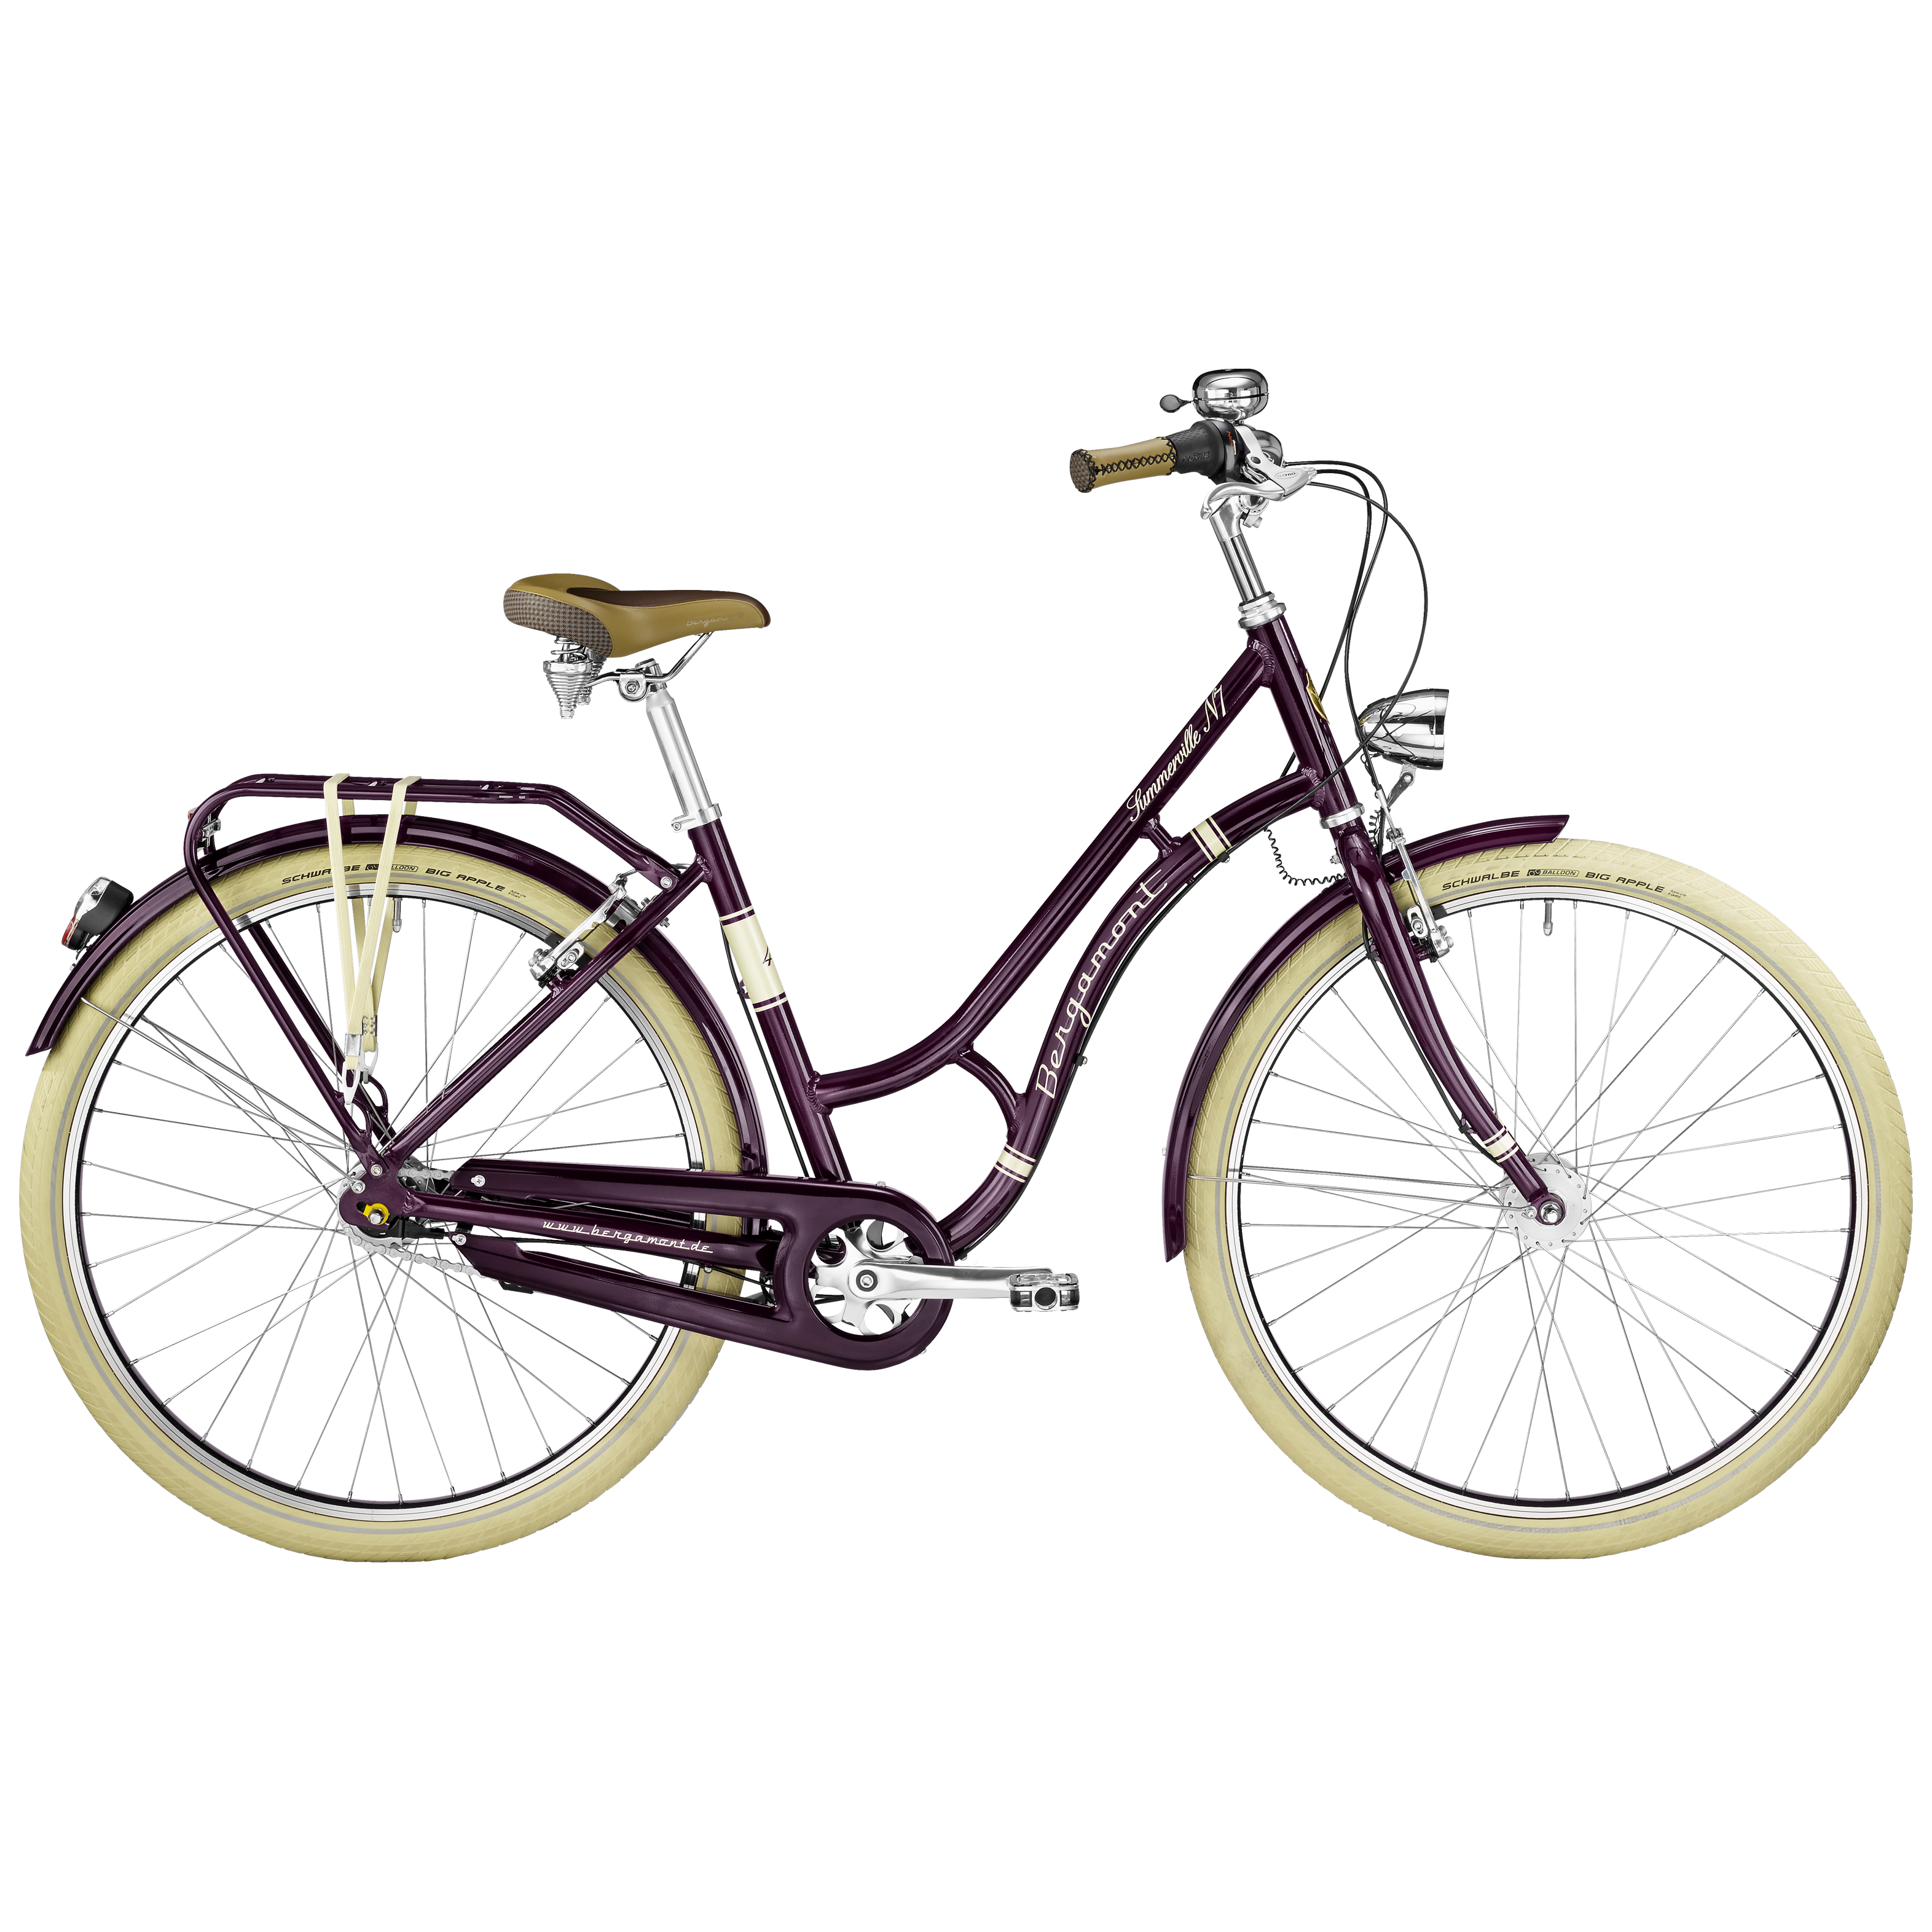 bergamont bike summerville n7 cb online kaufen fahrrad krause. Black Bedroom Furniture Sets. Home Design Ideas